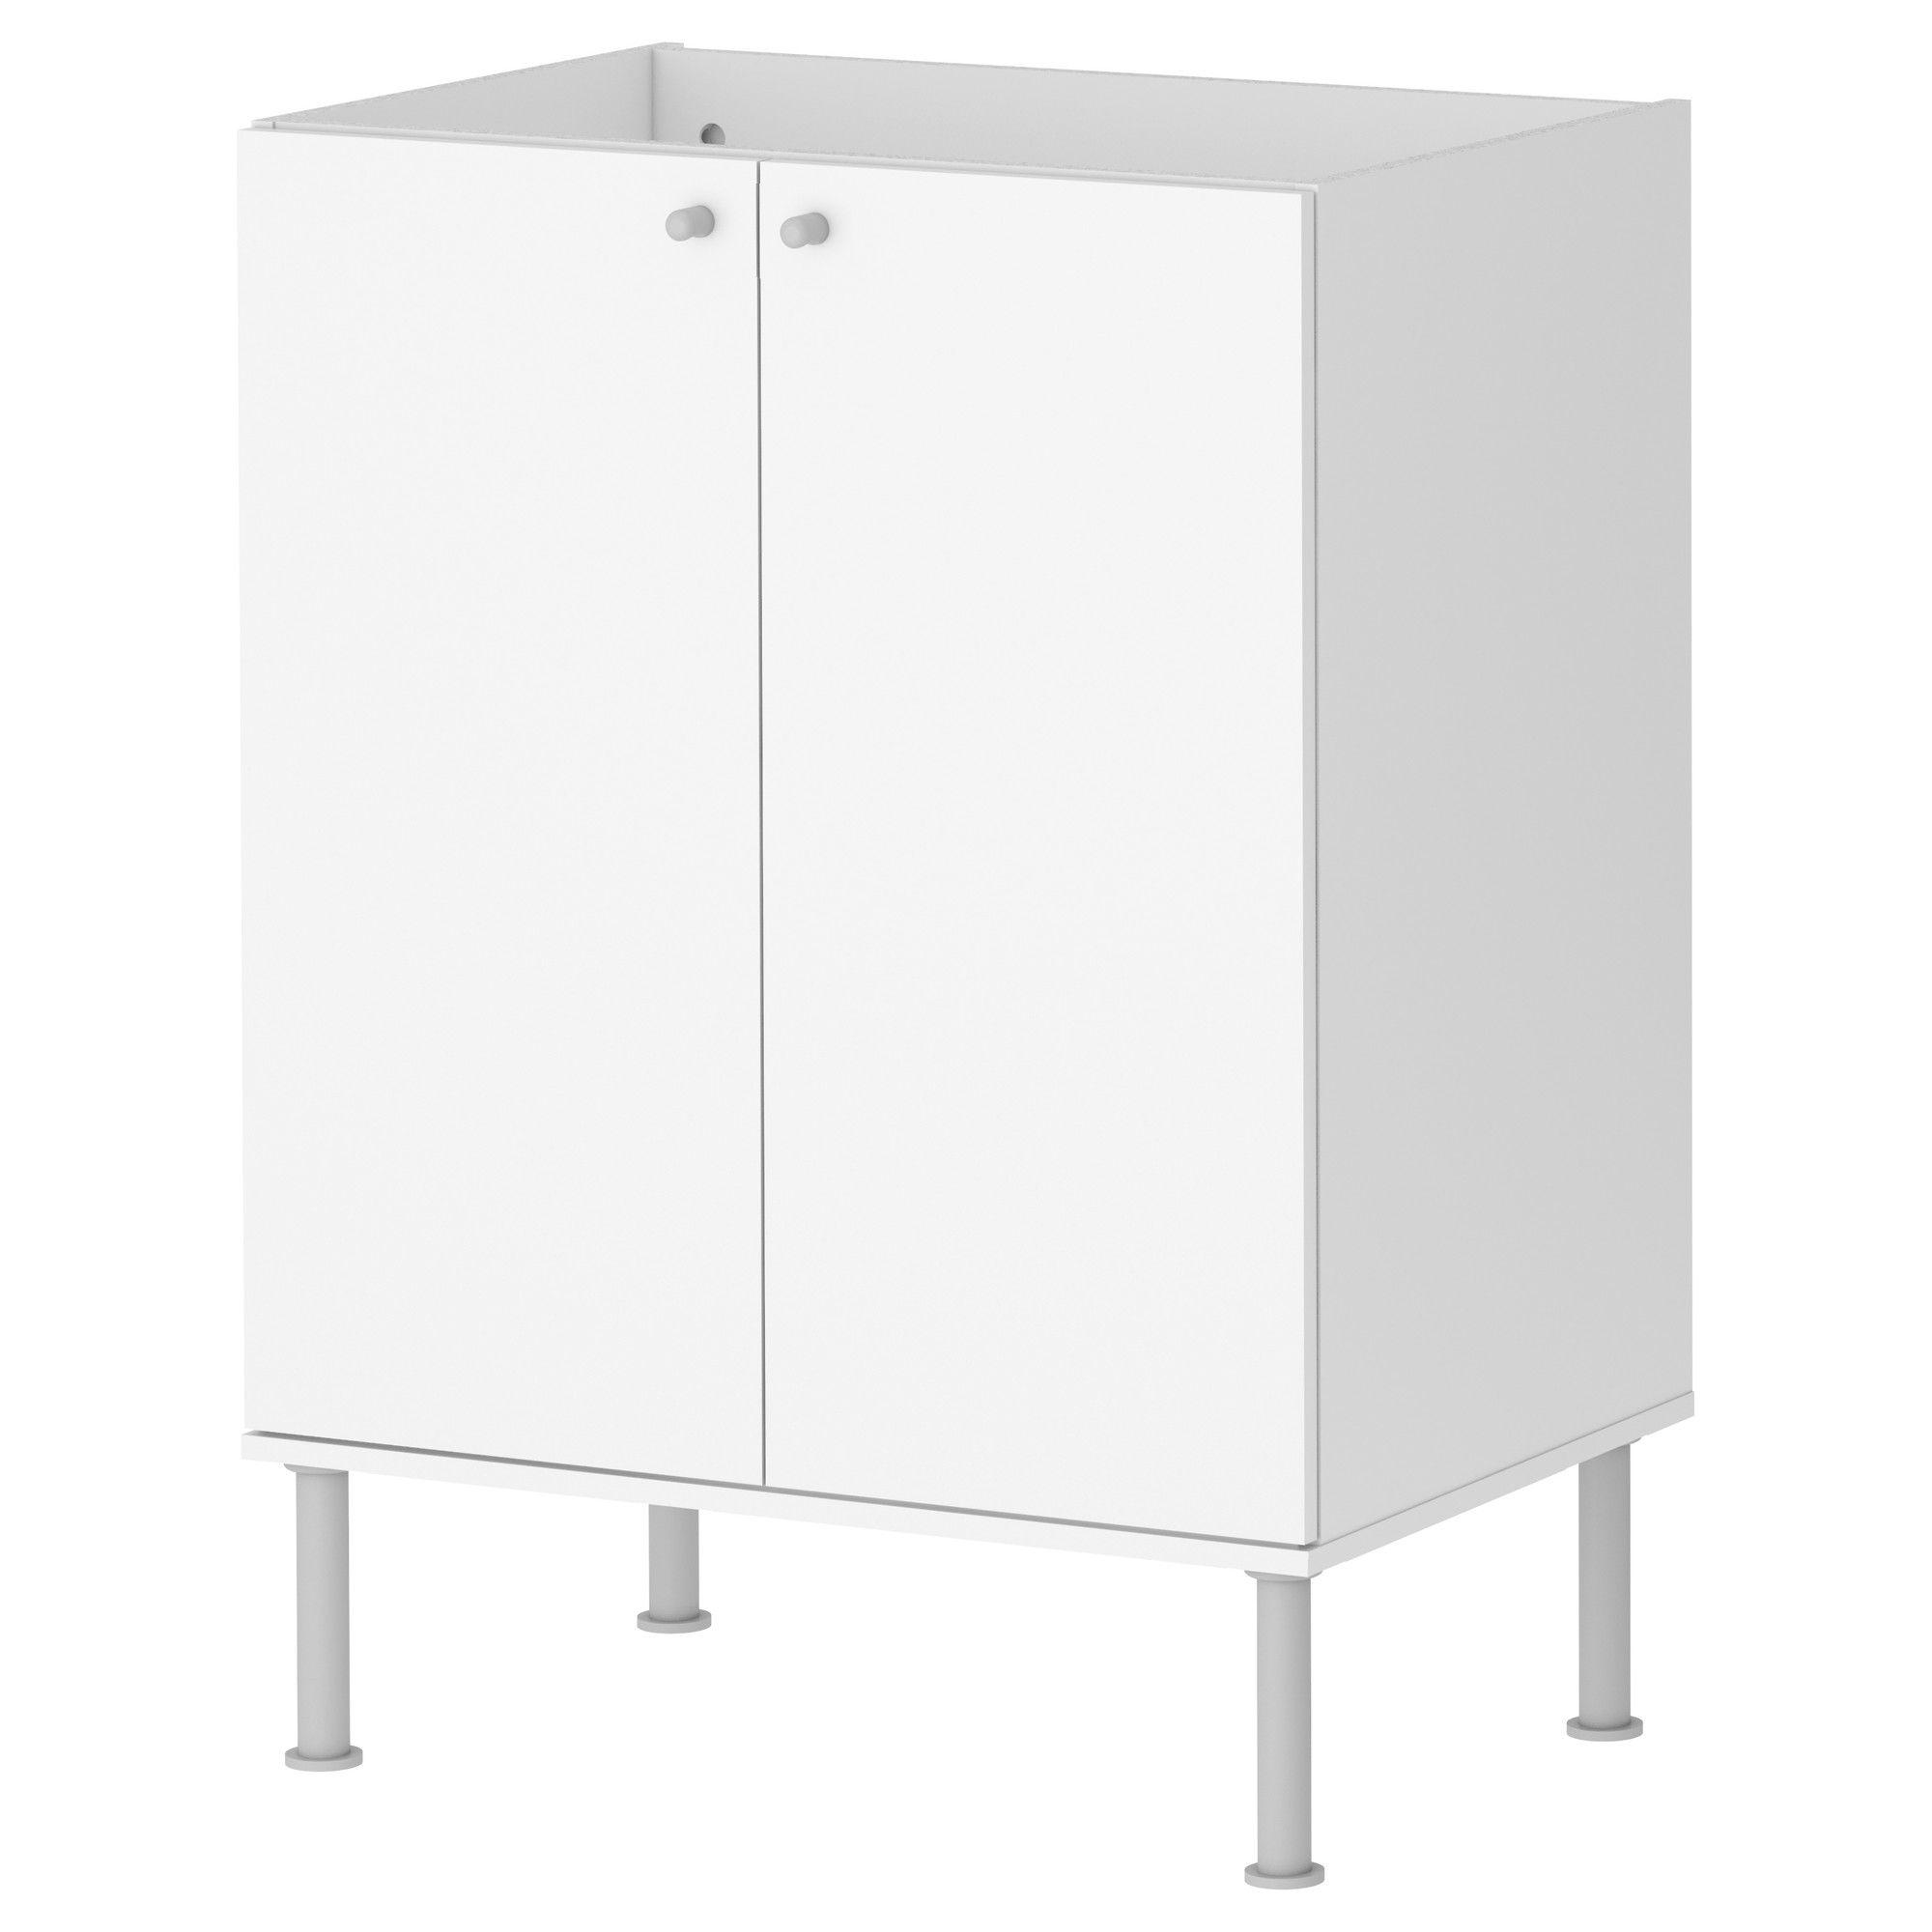 FULLEN Sink cabinet white